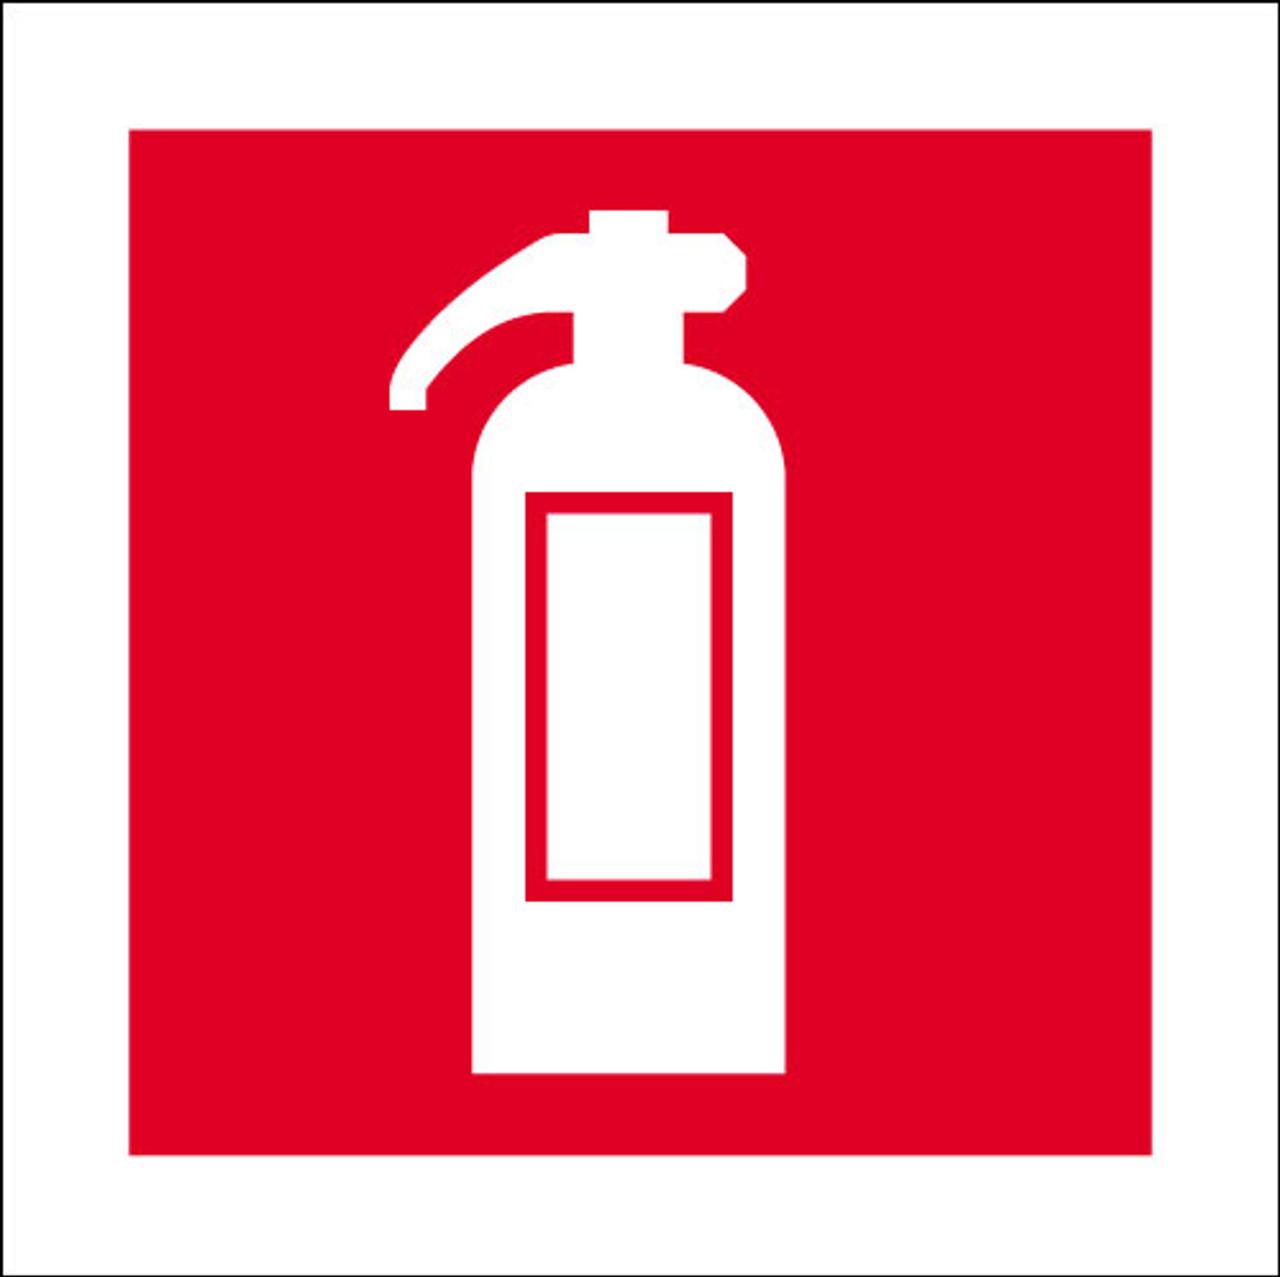 Fire extinguisher logo